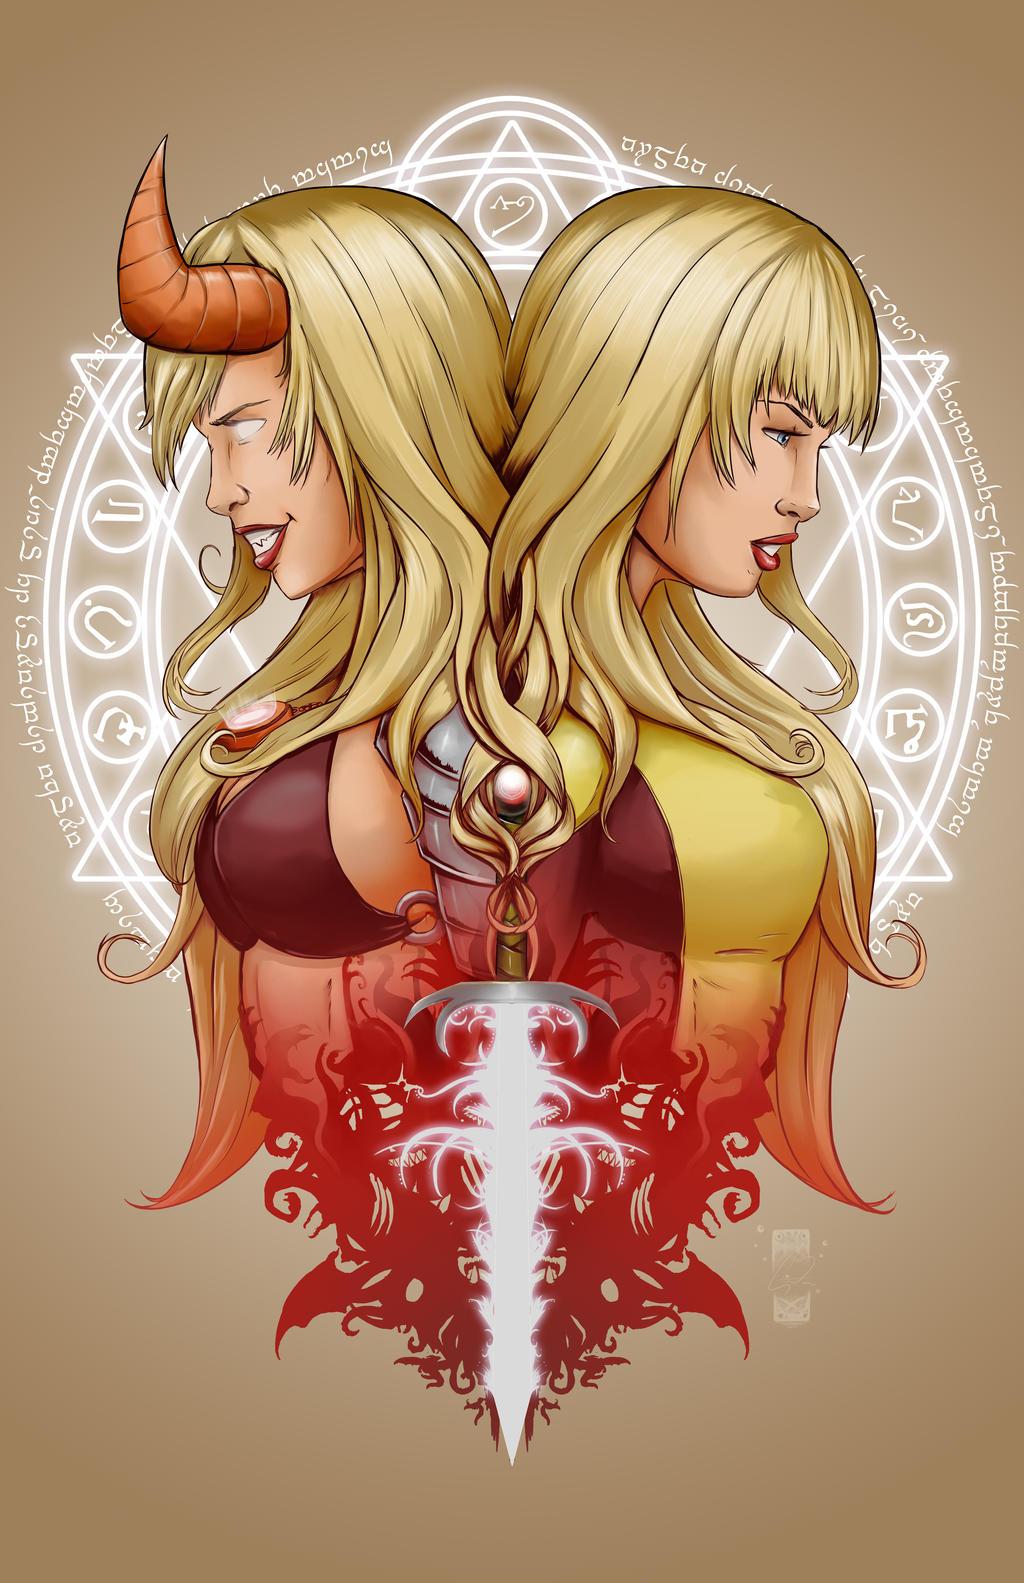 Magik Sorceress of Limbo by steevinlove